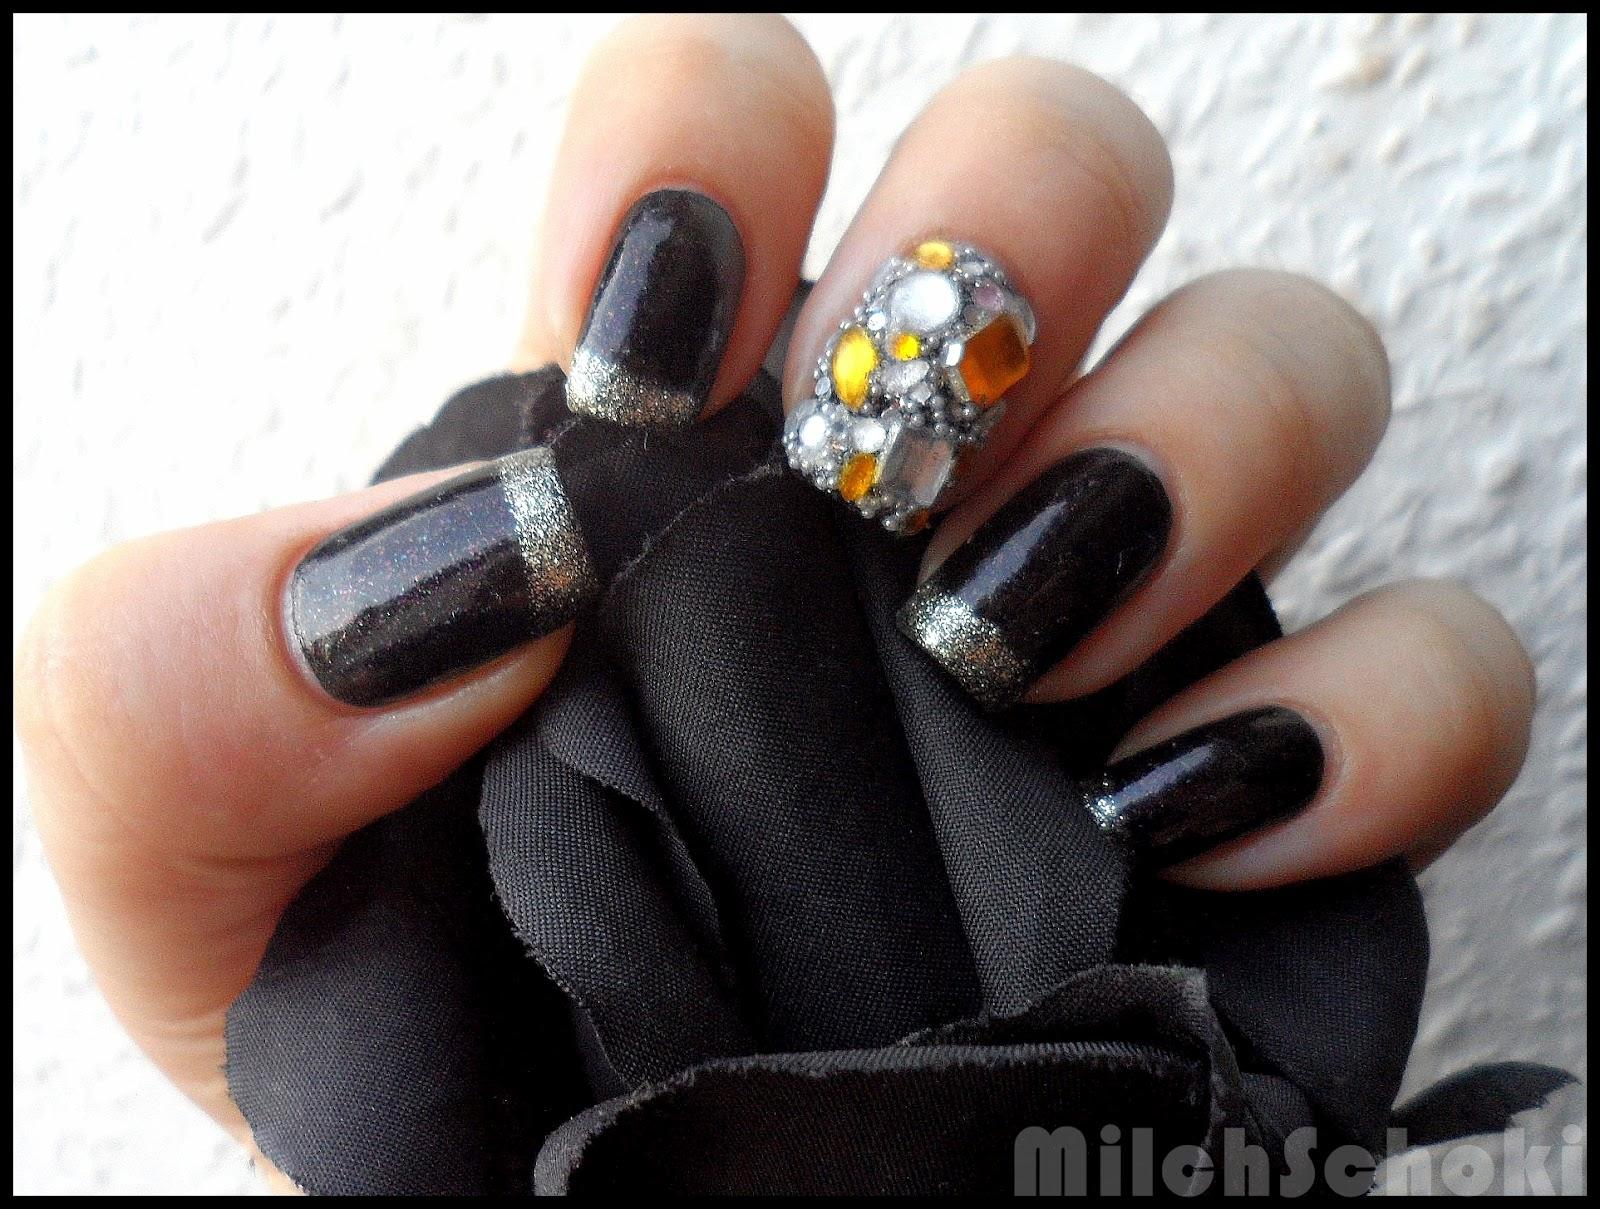 beautyecke nail art collaboration die 7 tods nden habgier. Black Bedroom Furniture Sets. Home Design Ideas